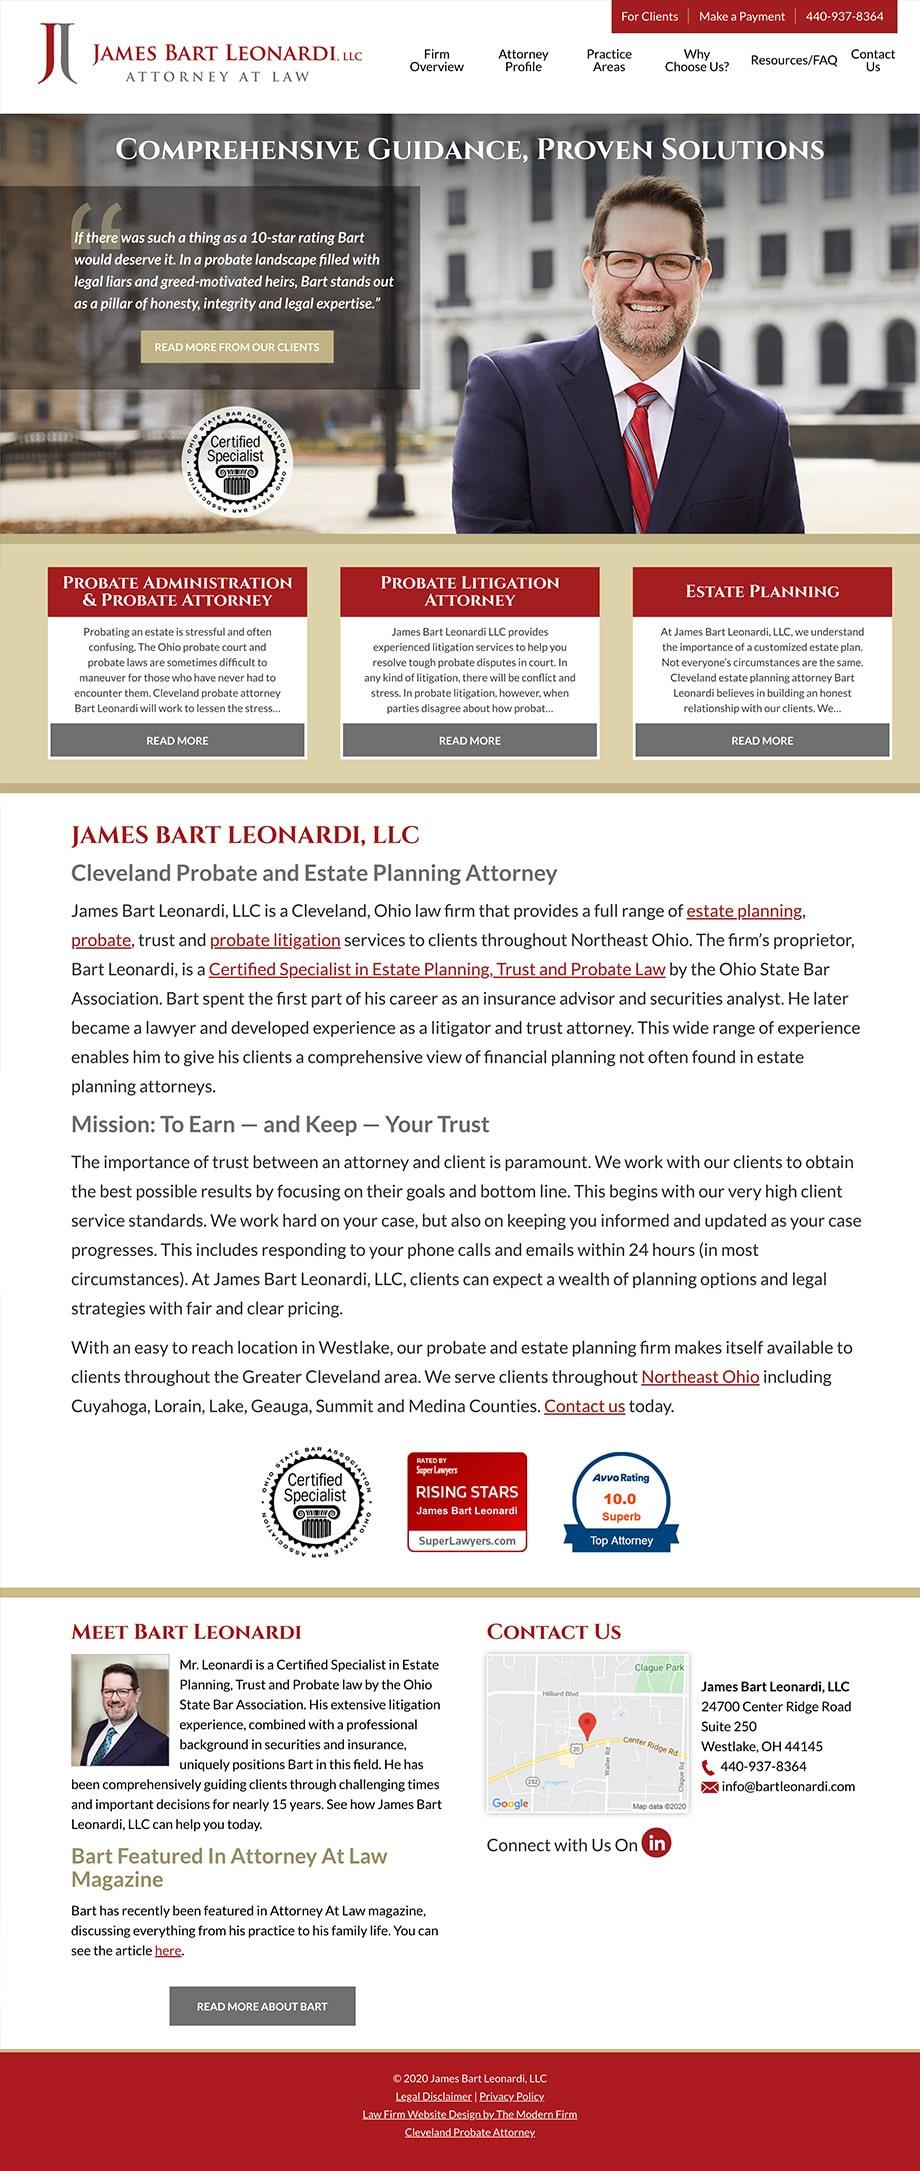 Law Firm Website Design for James Bart Leonardi, LLC